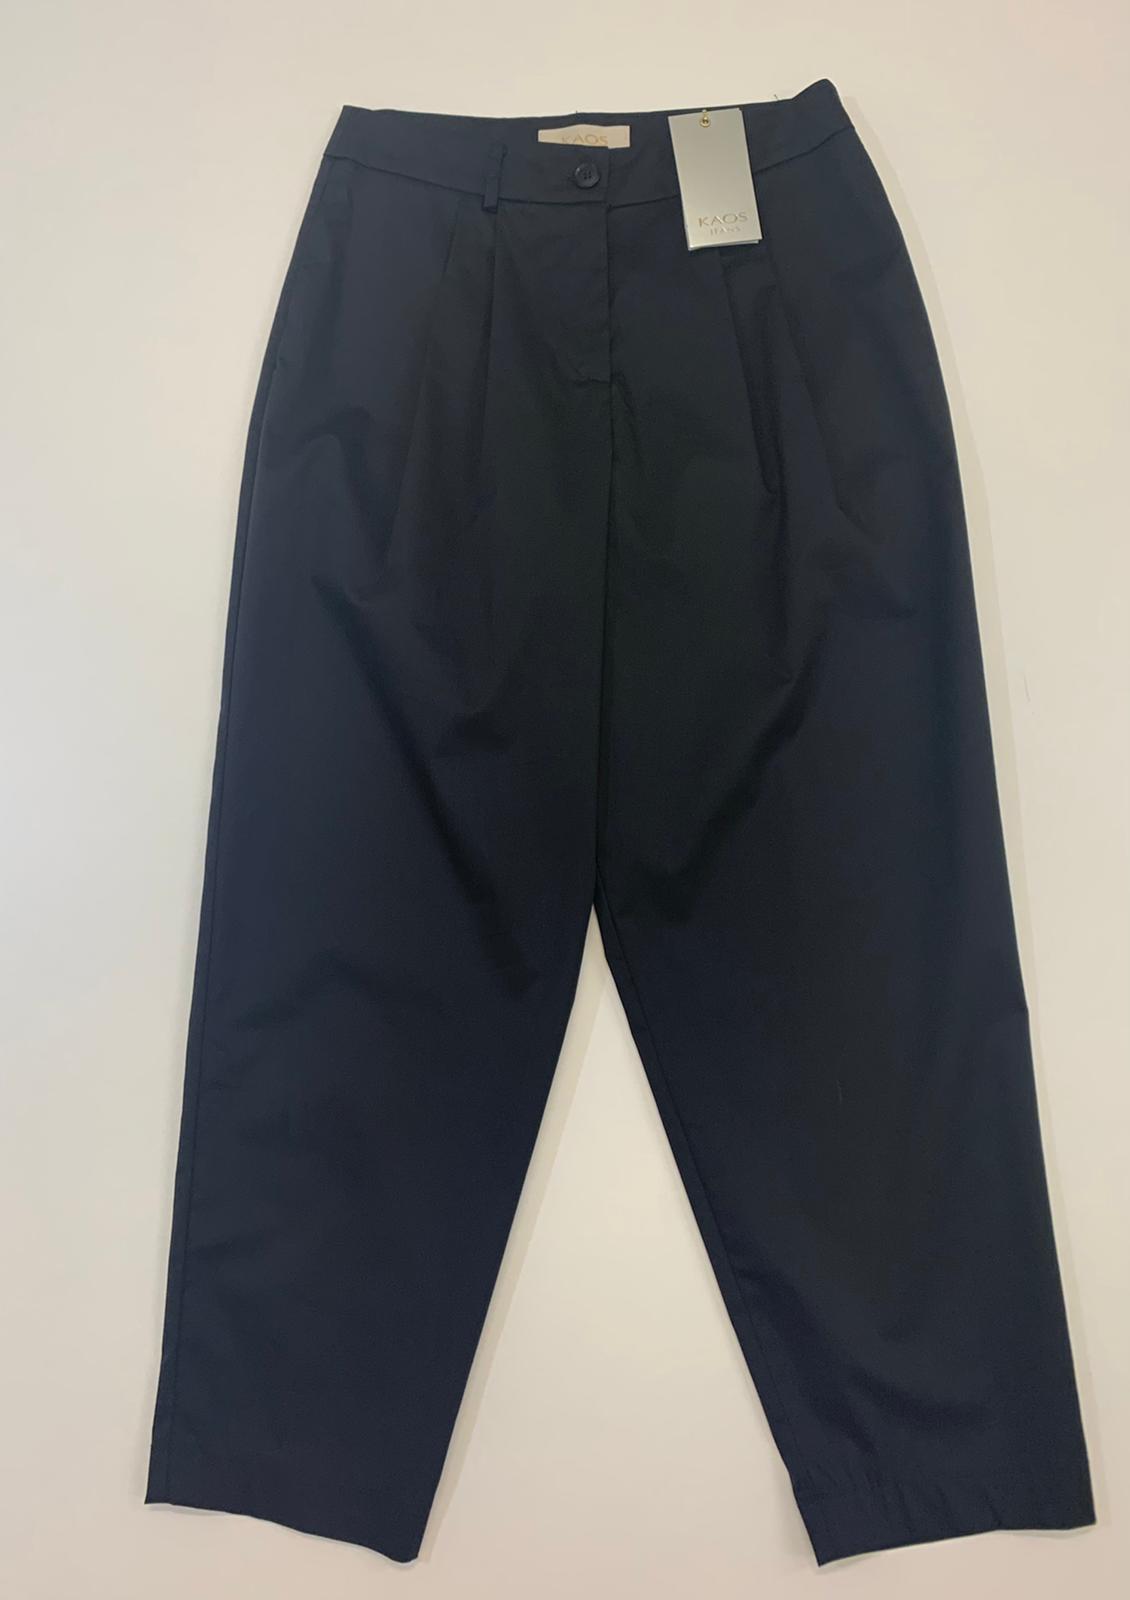 Pantalone Kaos Jeans Pence Nero